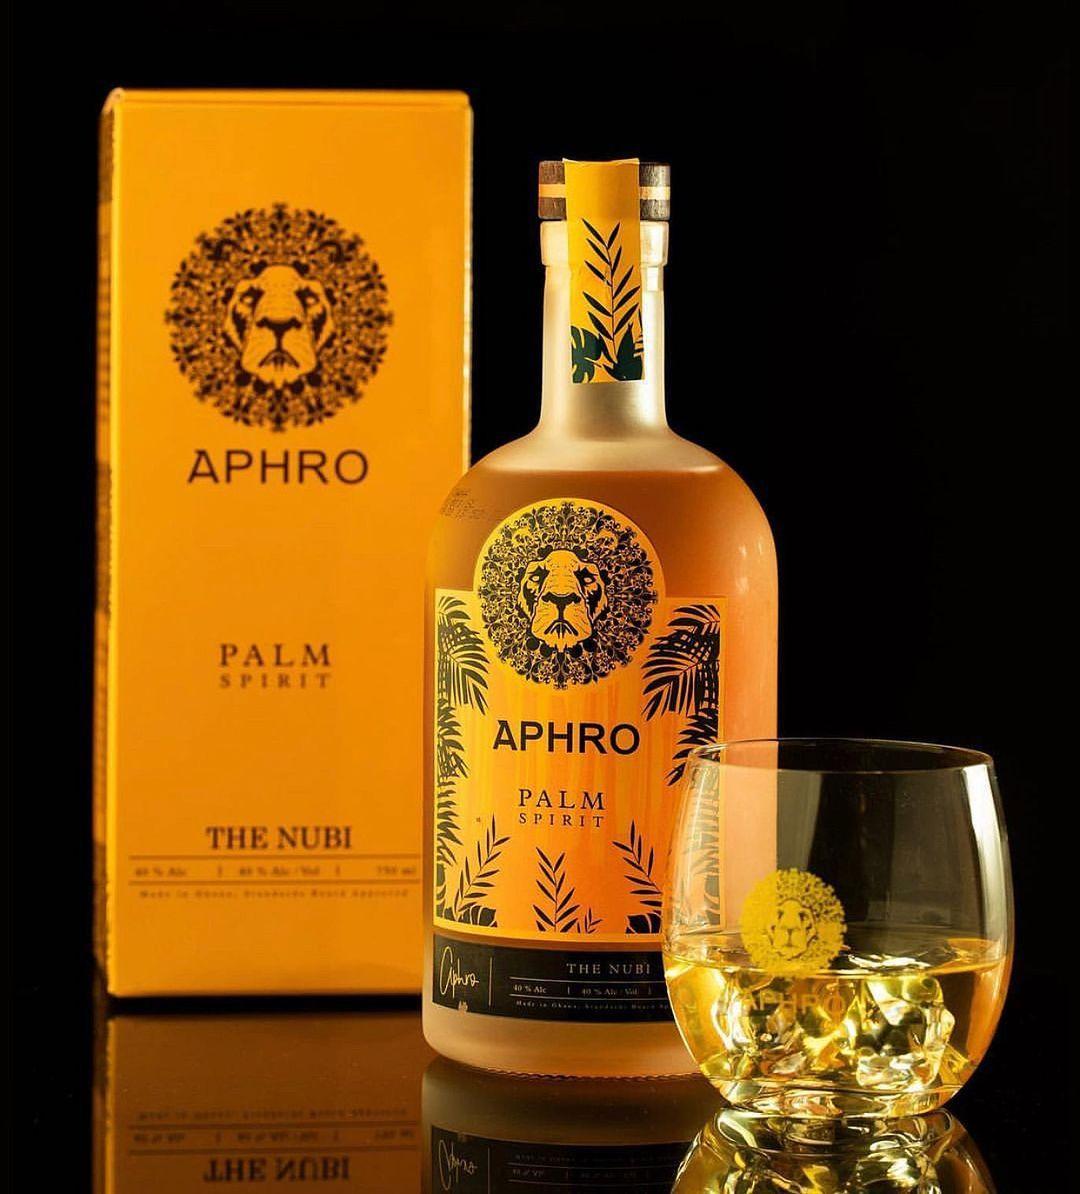 Peter Okoye 'Mr P' Launches Wine Company, Aphro